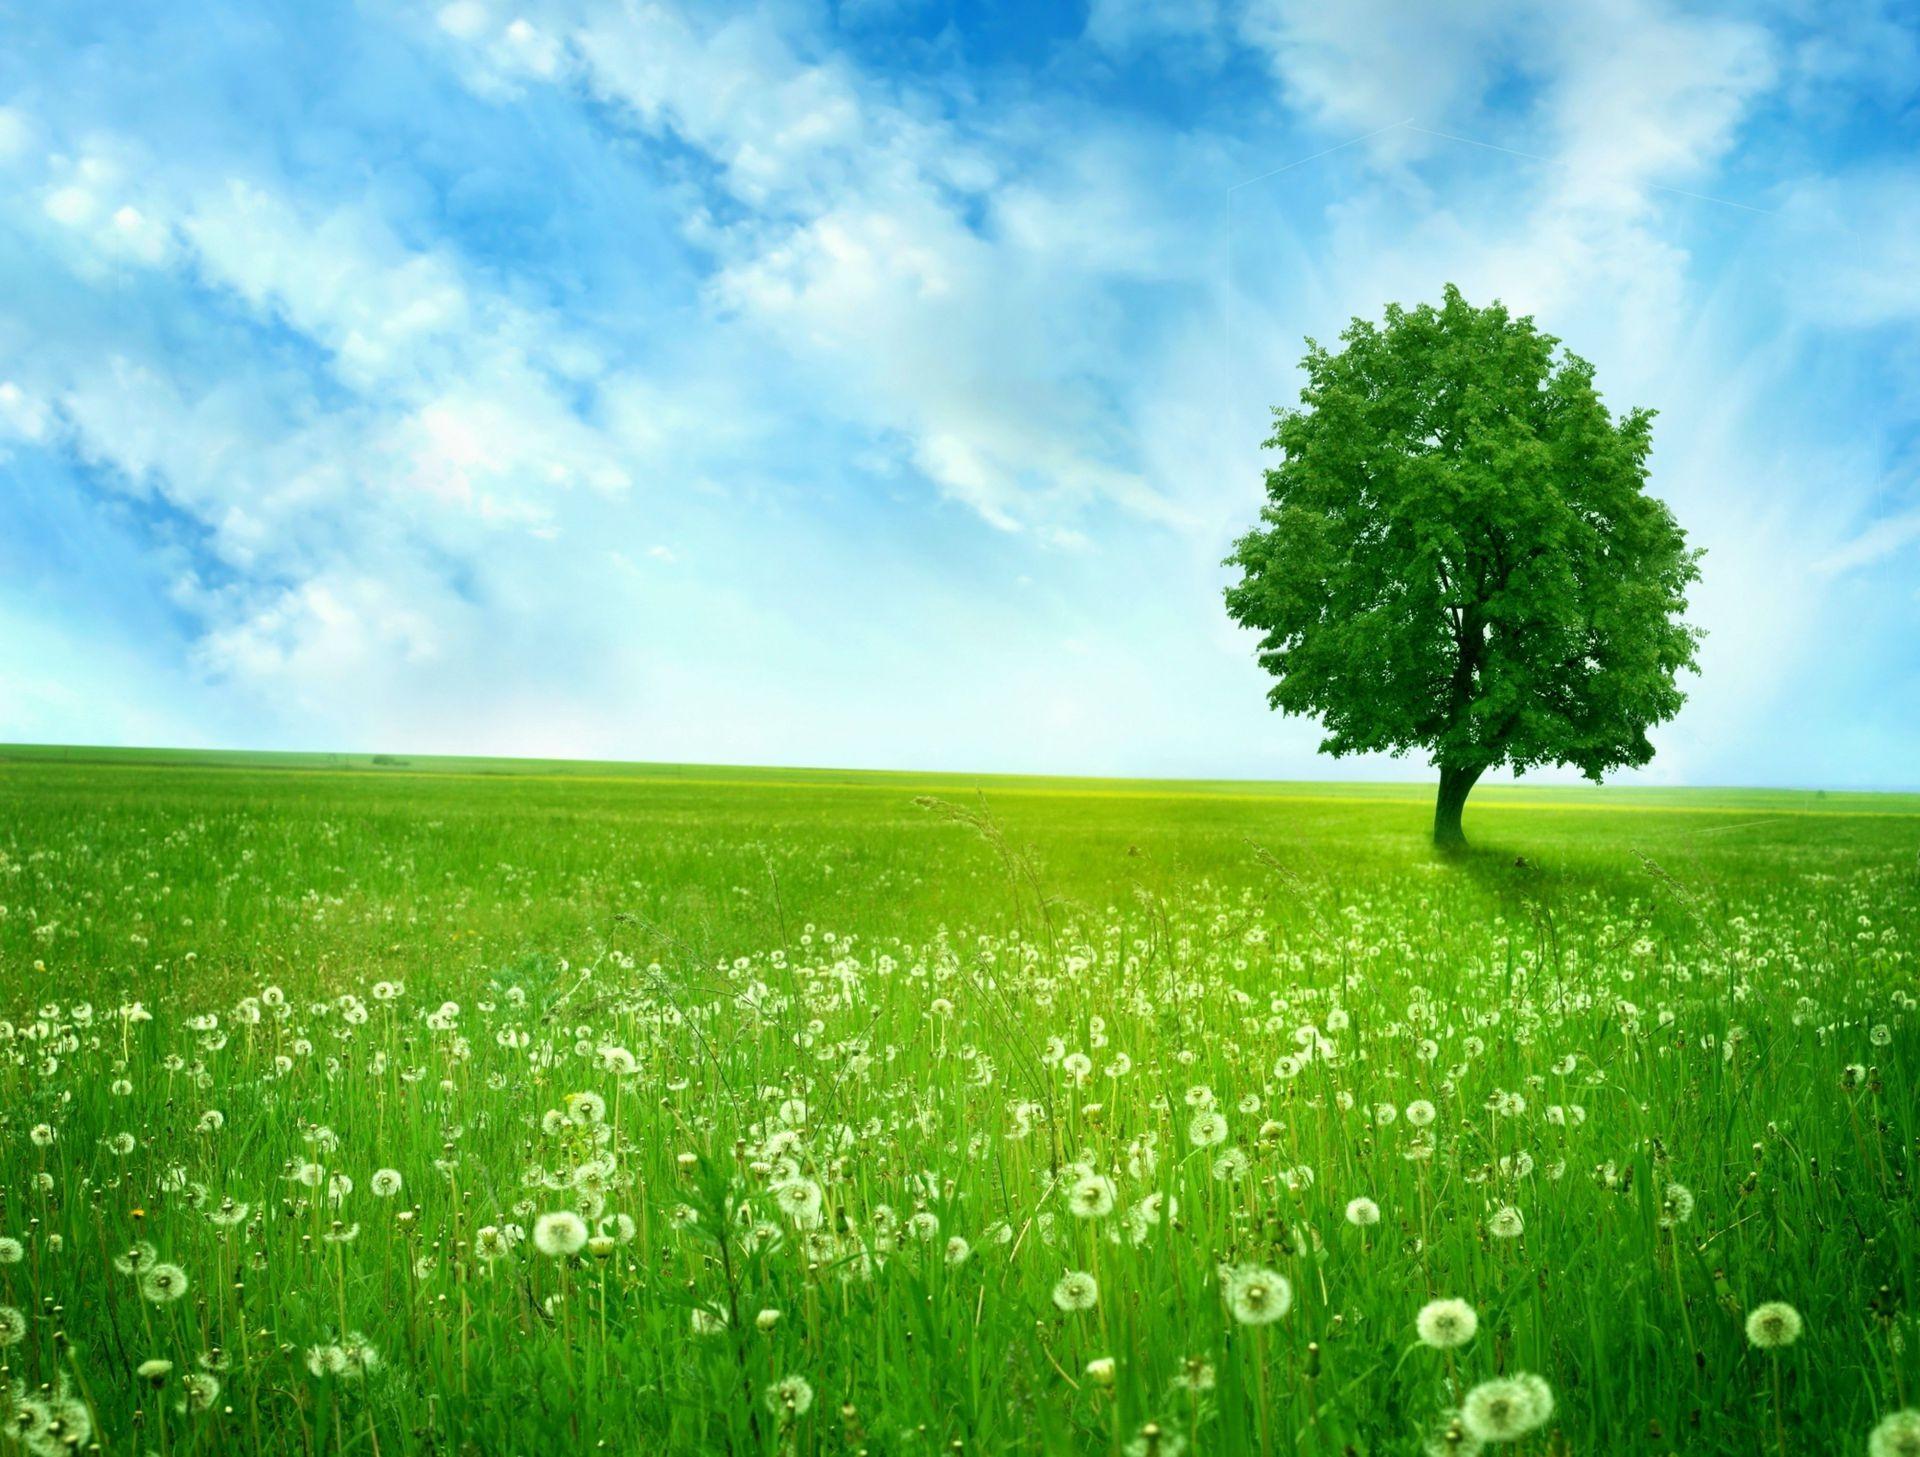 лужайка трава небо бесплатно